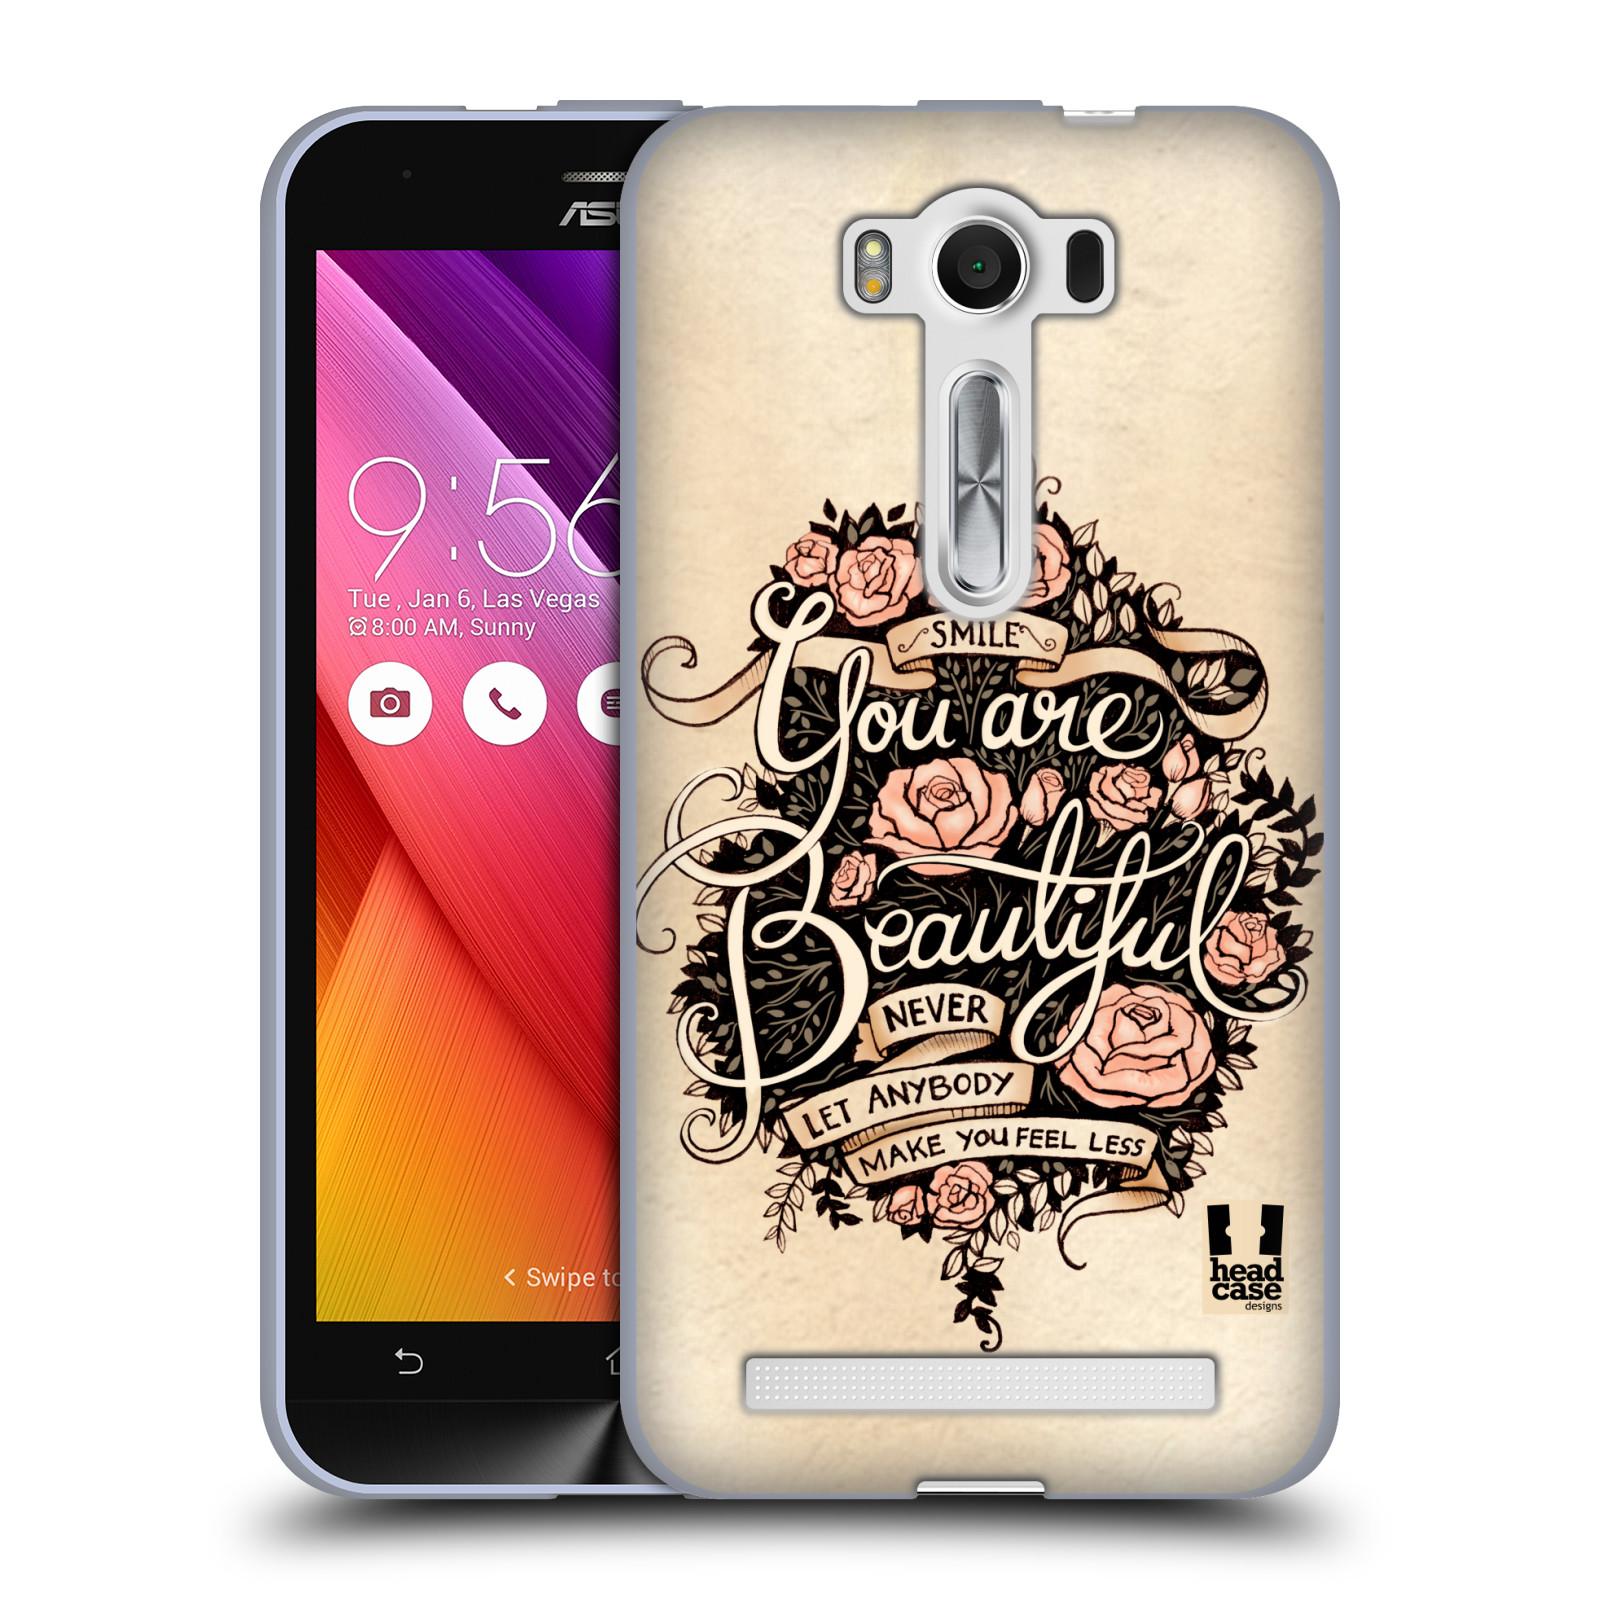 "Silikonové pouzdro na mobil Asus ZenFone 2 Laser ZE500KL HEAD CASE BEAUTIFUL (Silikonový kryt či obal na mobilní telefon Asus ZenFone 2 Laser ZE500KL s 5"" displejem)"